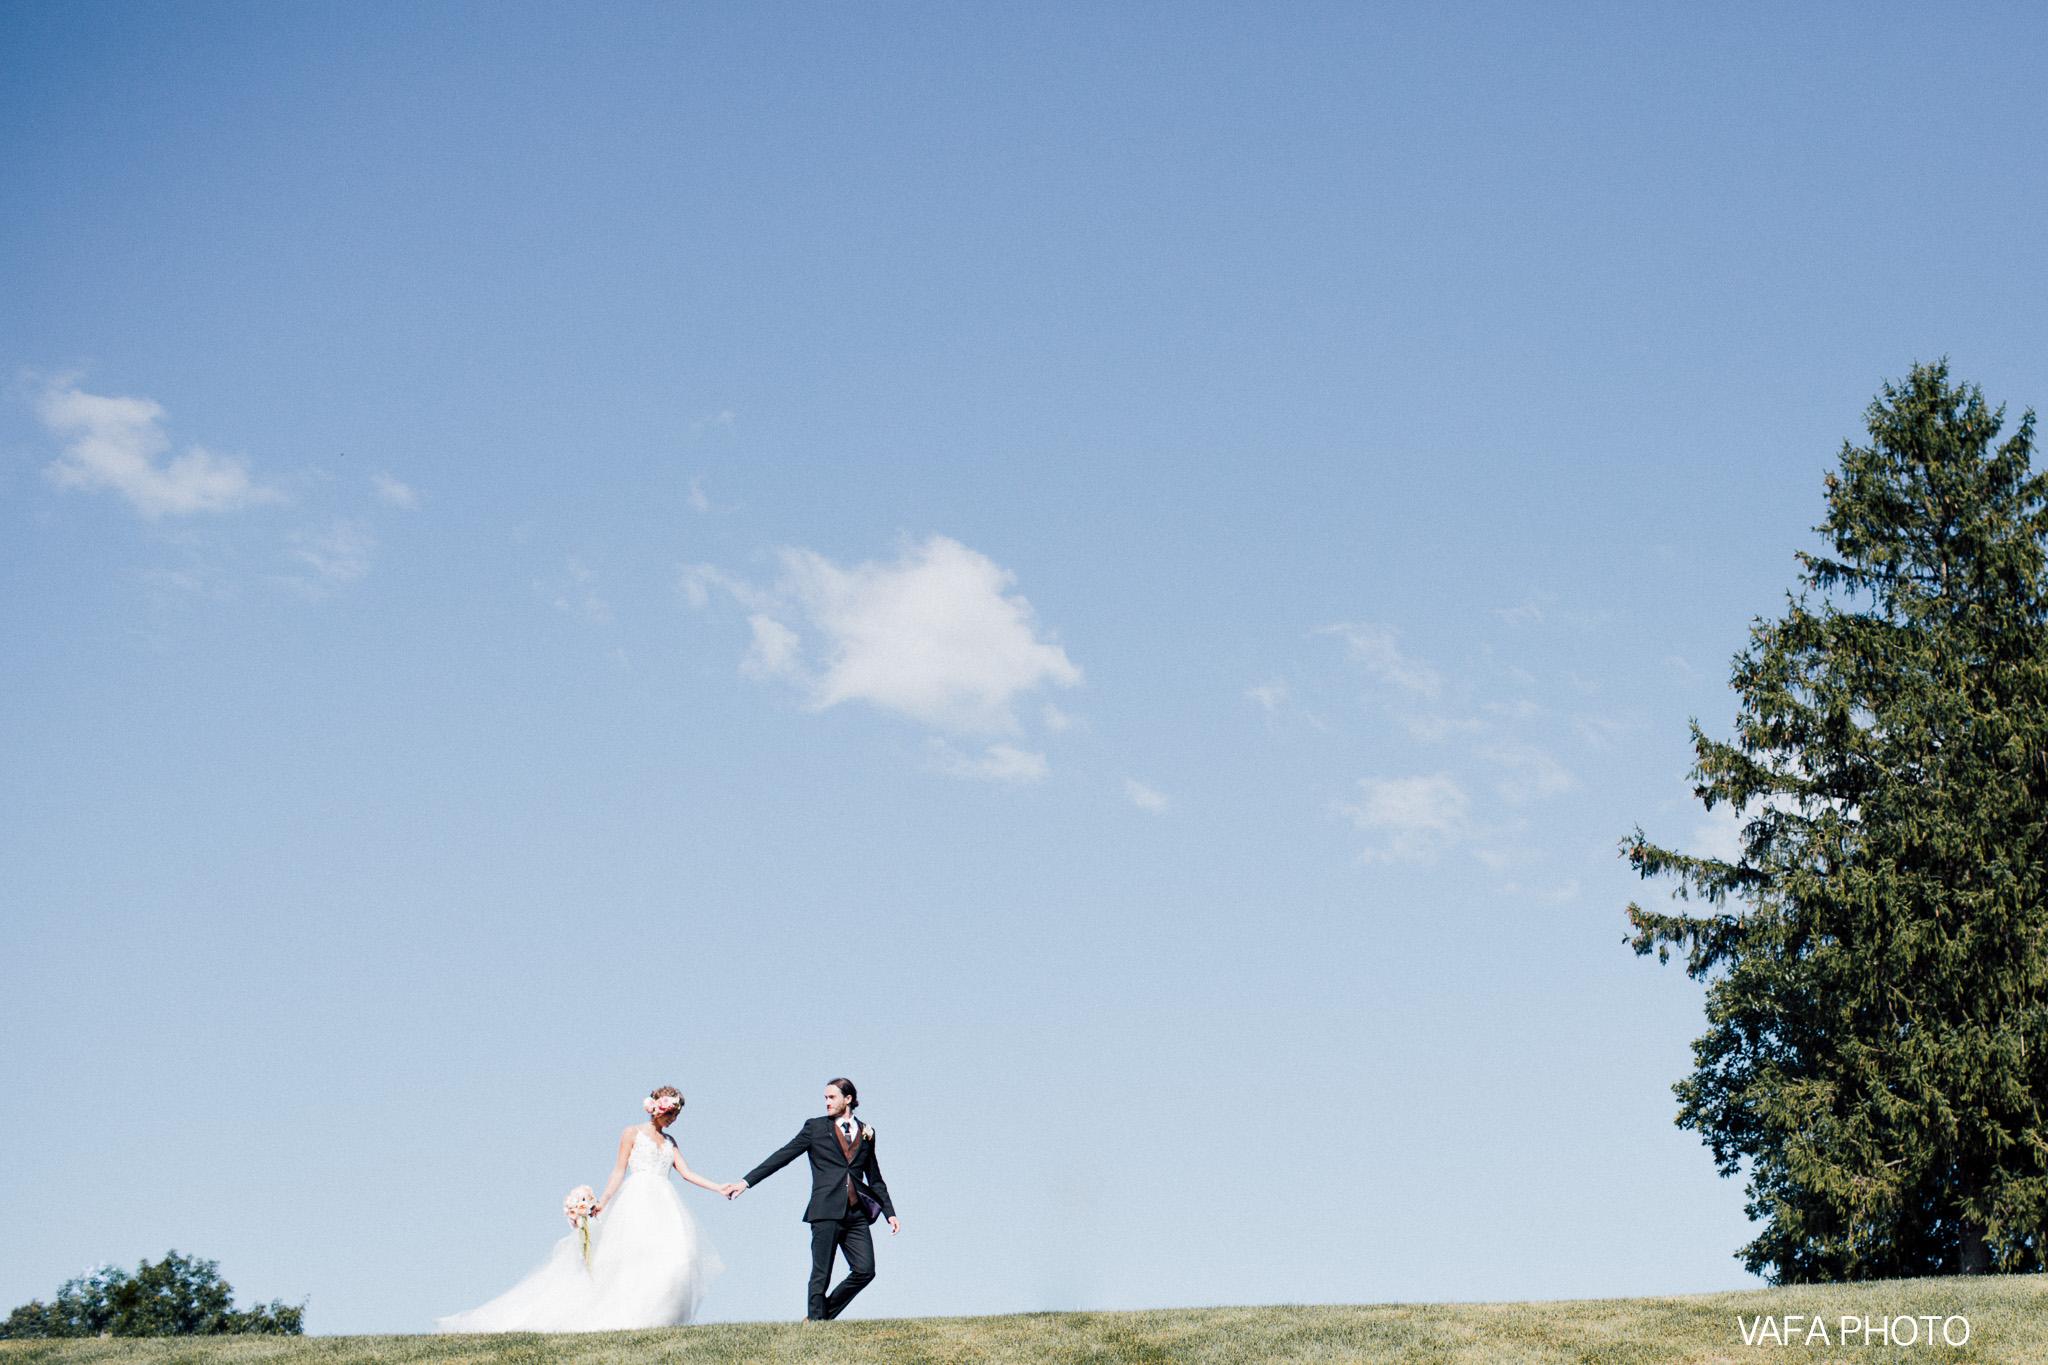 The-Felt-Estate-Wedding-Kailie-David-Vafa-Photo-597.jpg